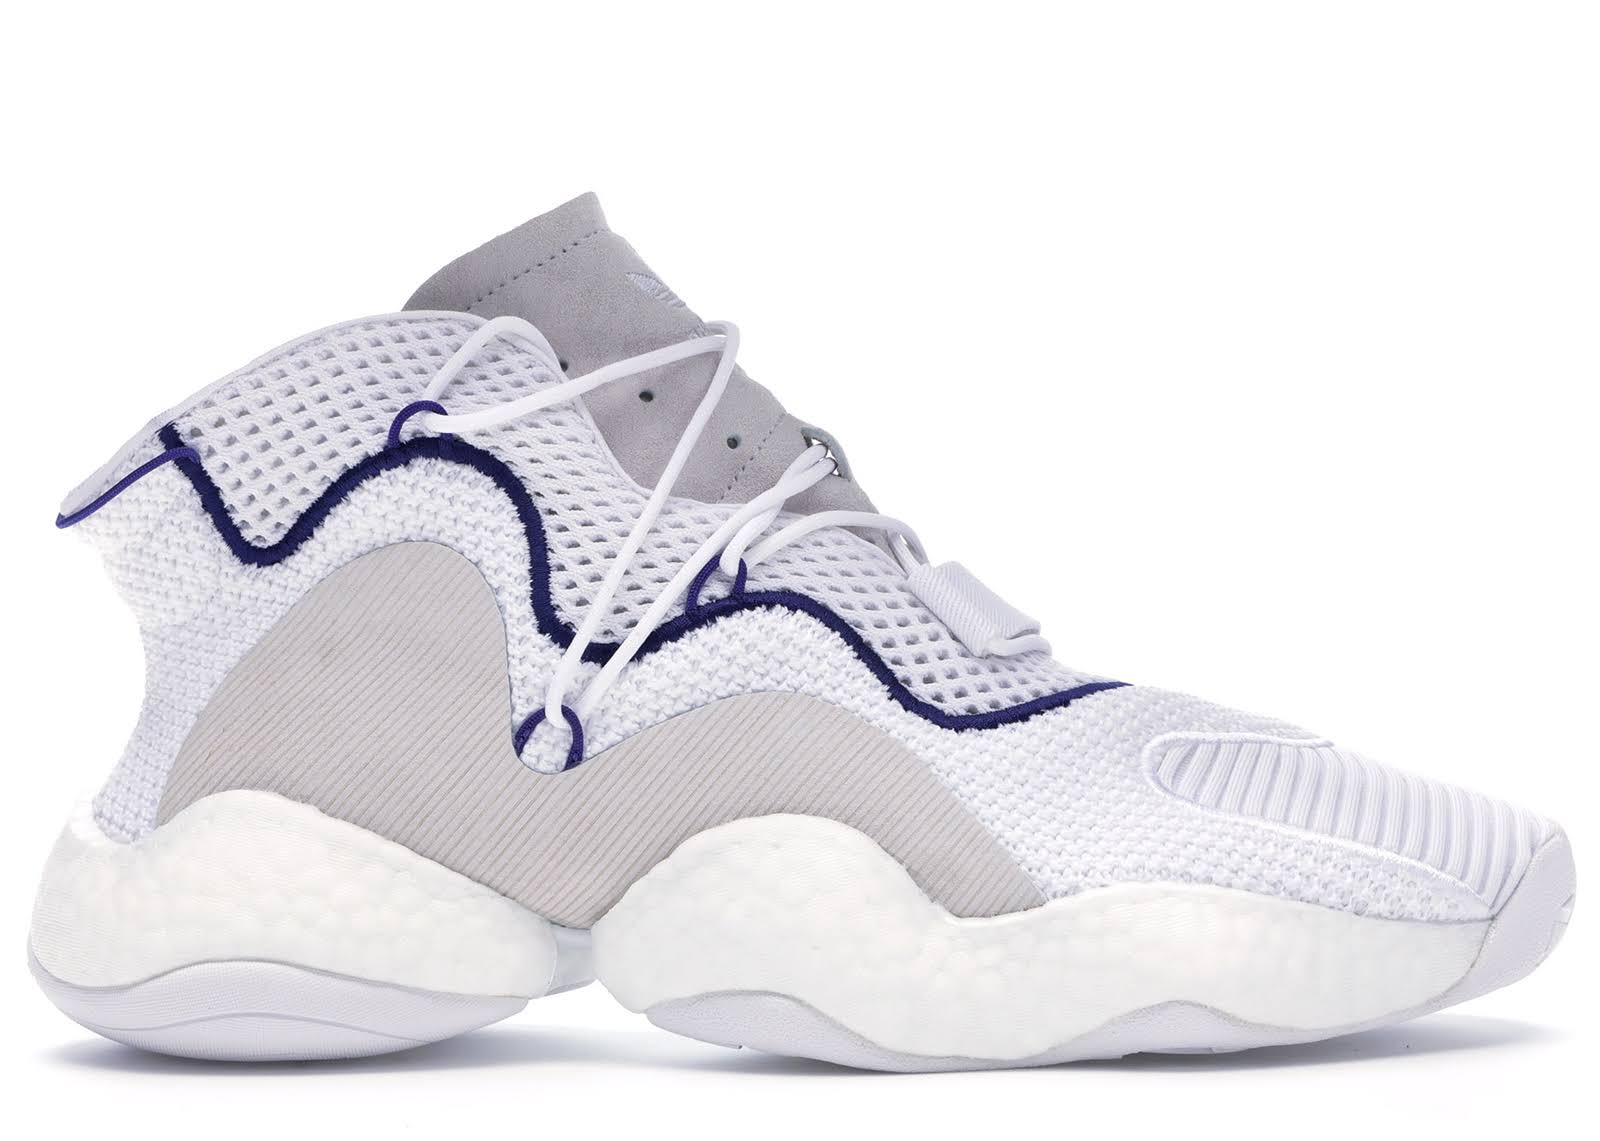 Adidas Crazy BYW LVL 1 White